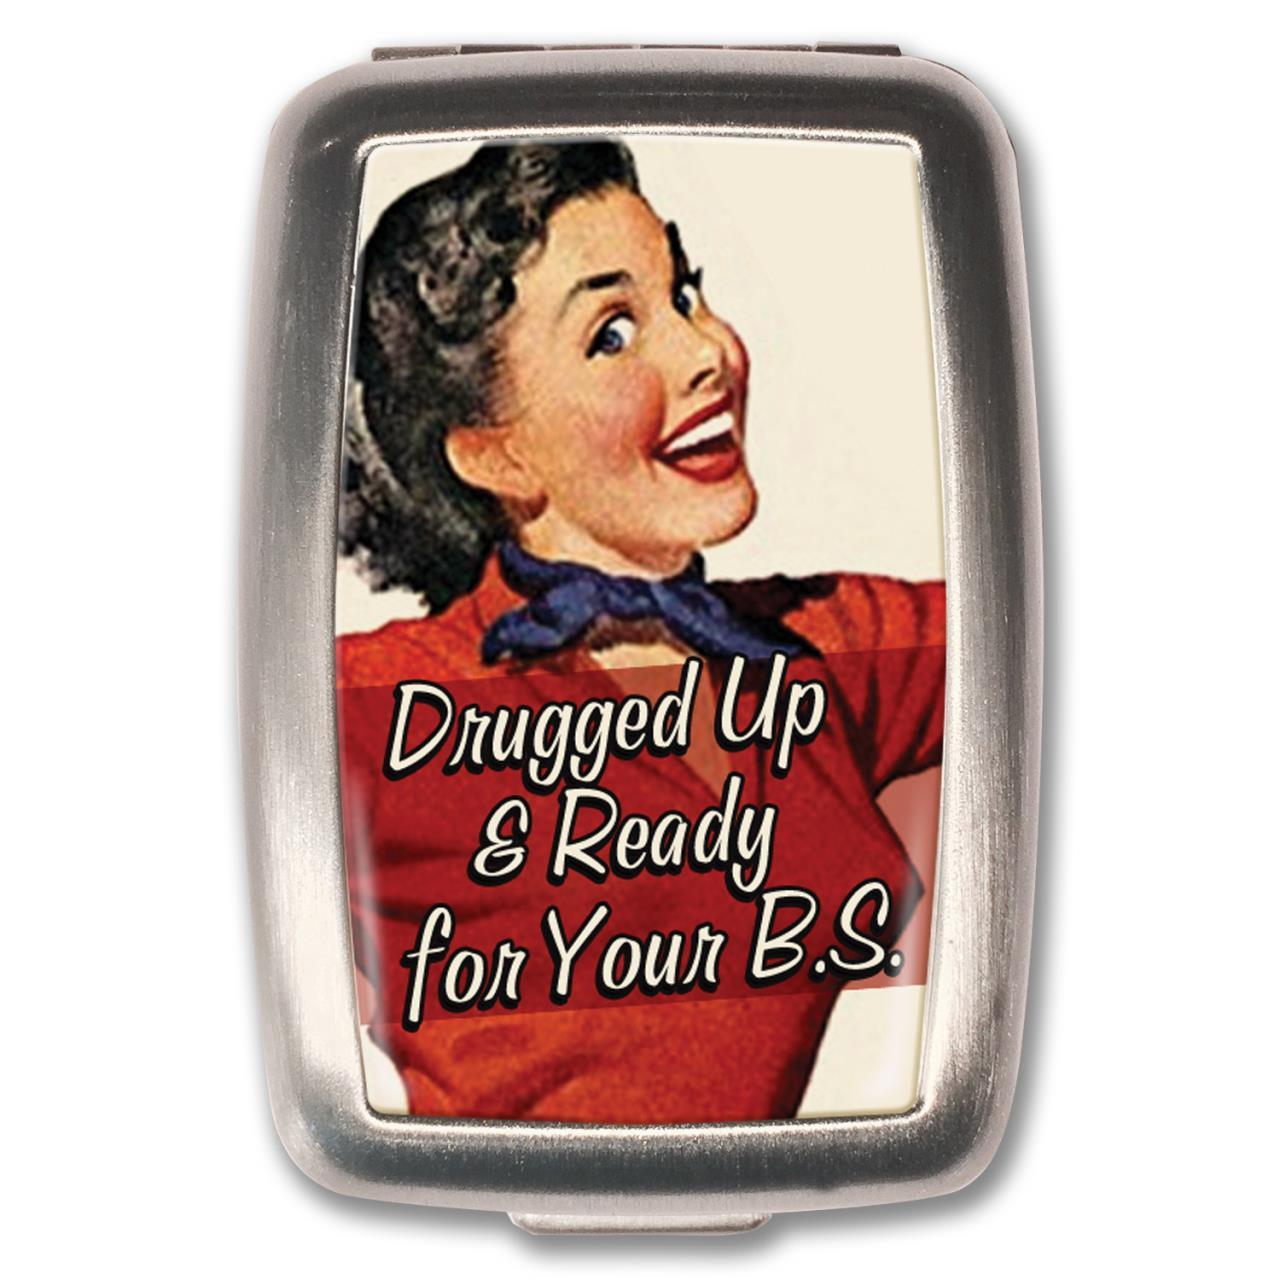 Drugged Up Pill Box - 0641938654981